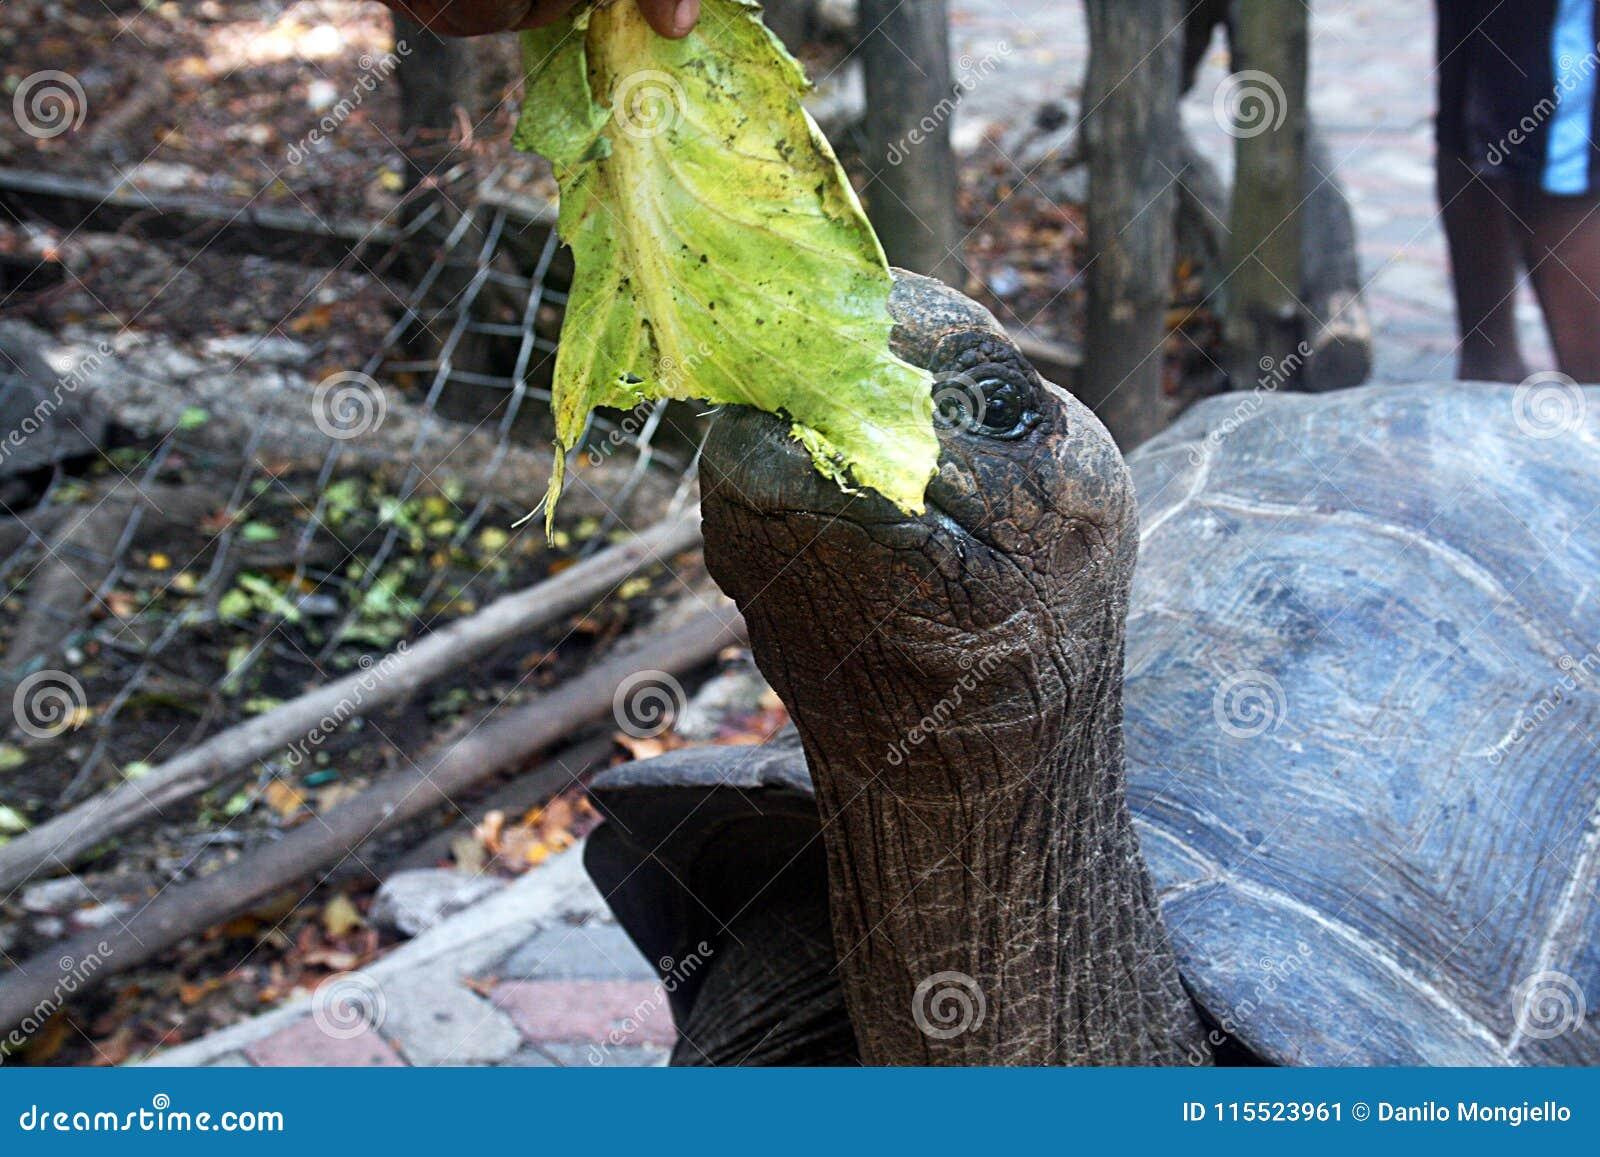 Tartaruga com fome